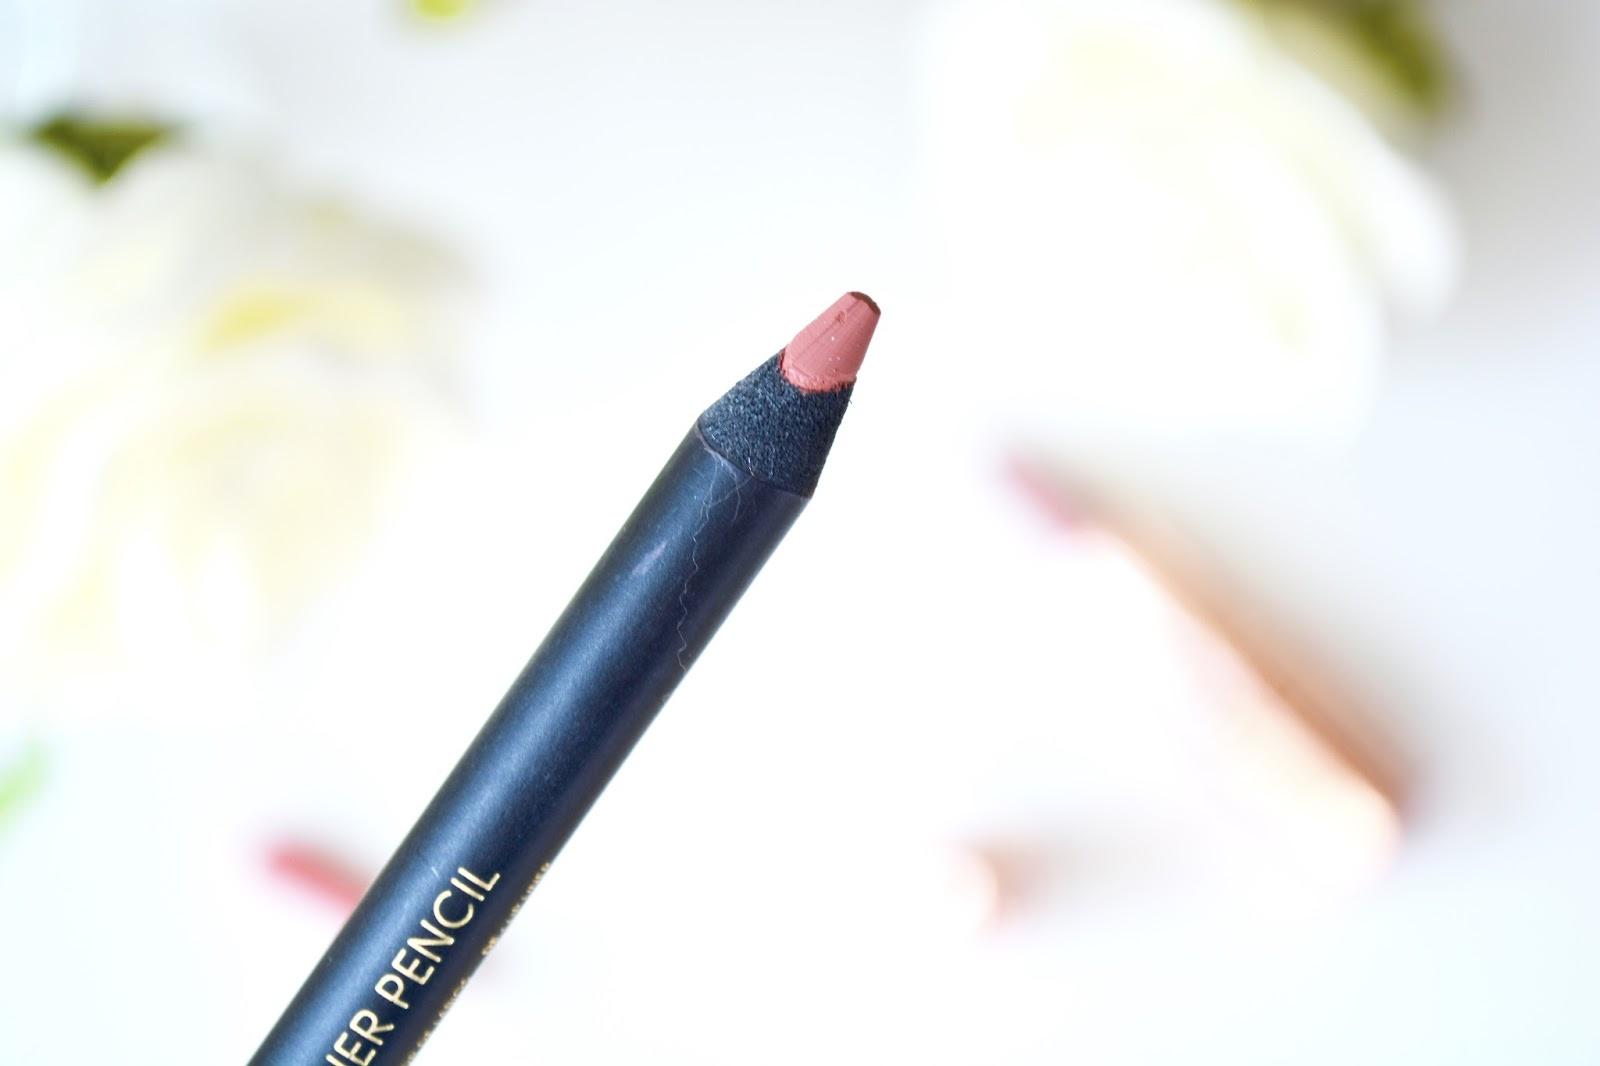 Makeup, Nude Lip, Nude Lipstick, Primark, Primark Nude Lip Liner, Makeup Revolution, Makeup Revolution Rose Gold Lipsticks, Makeup Revolution Cashmere Lipstick